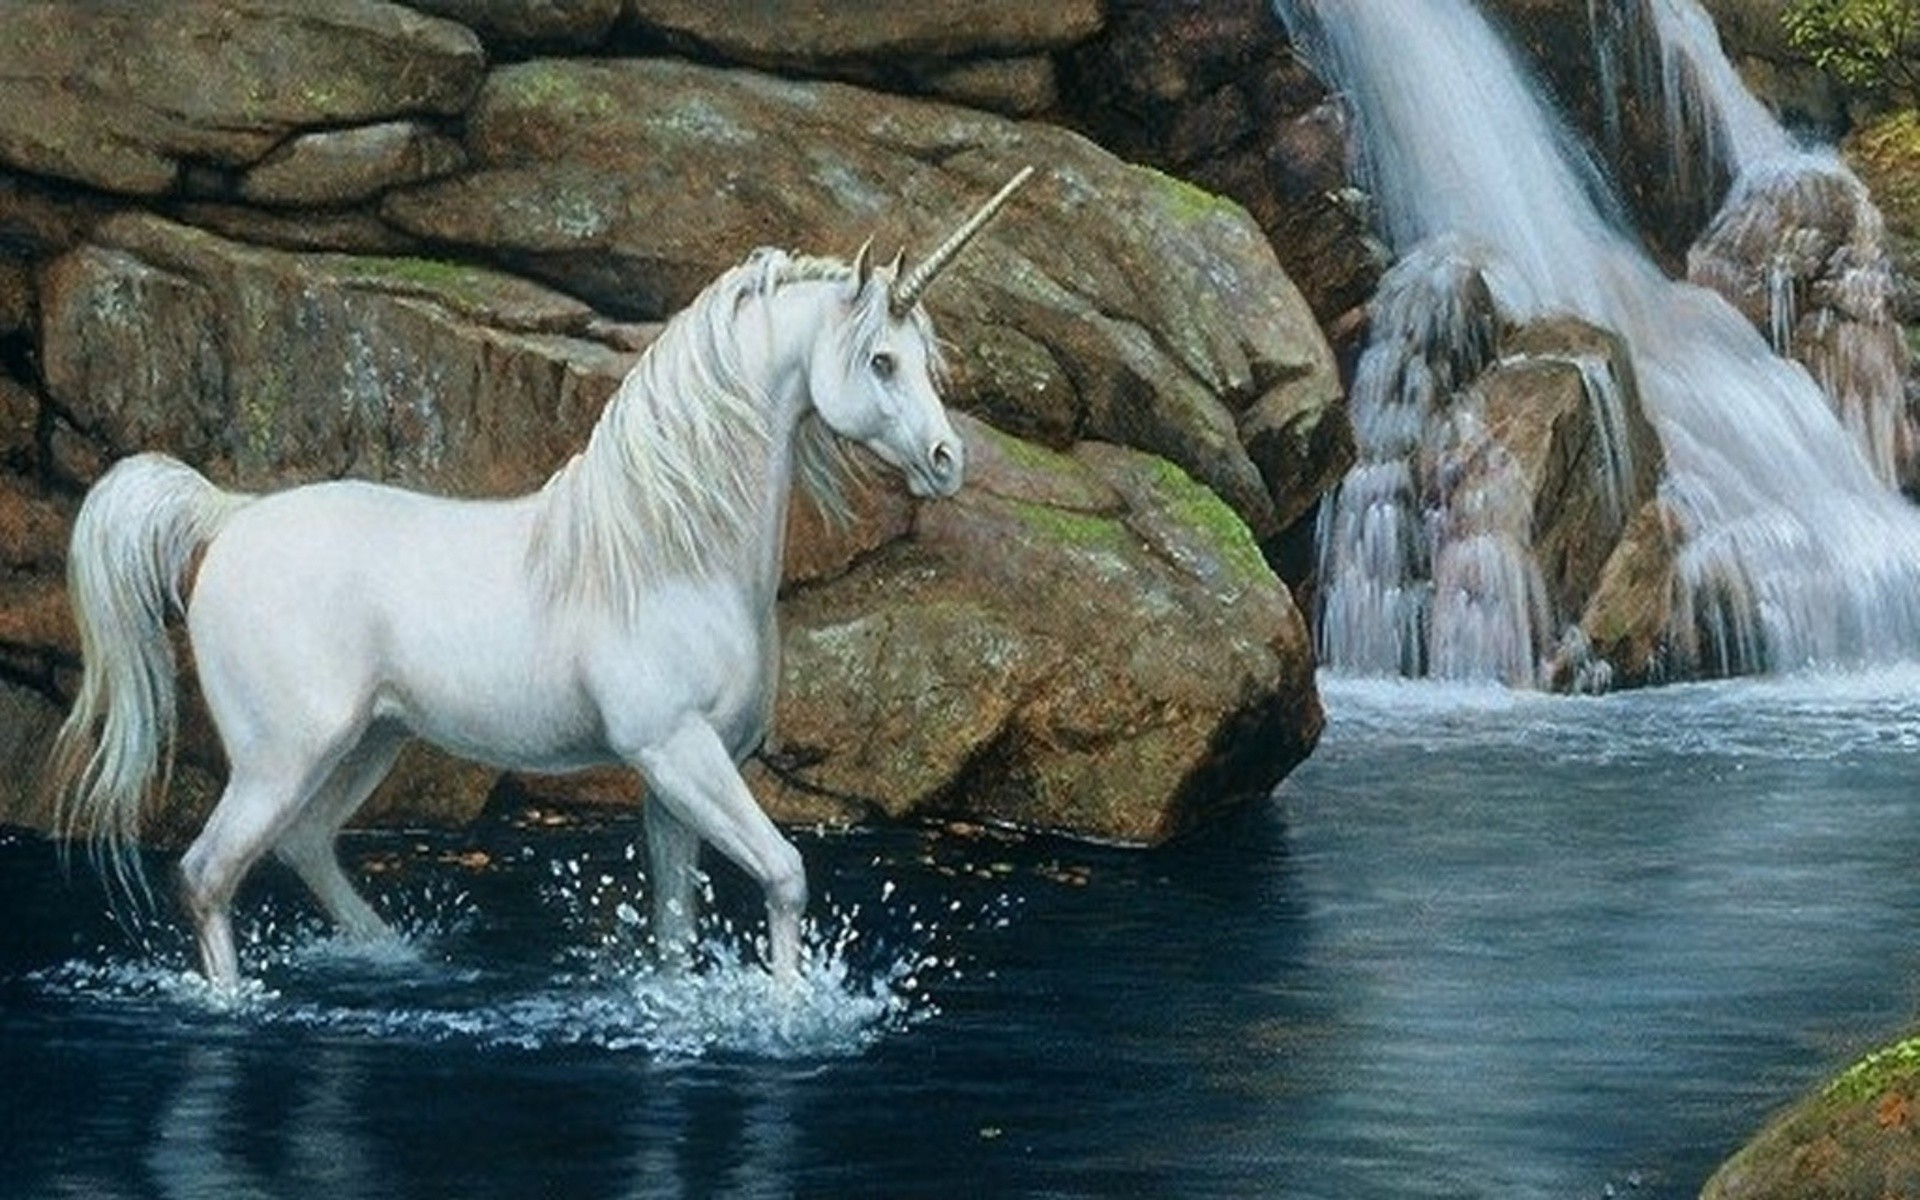 wallpaper horse (66+ images)